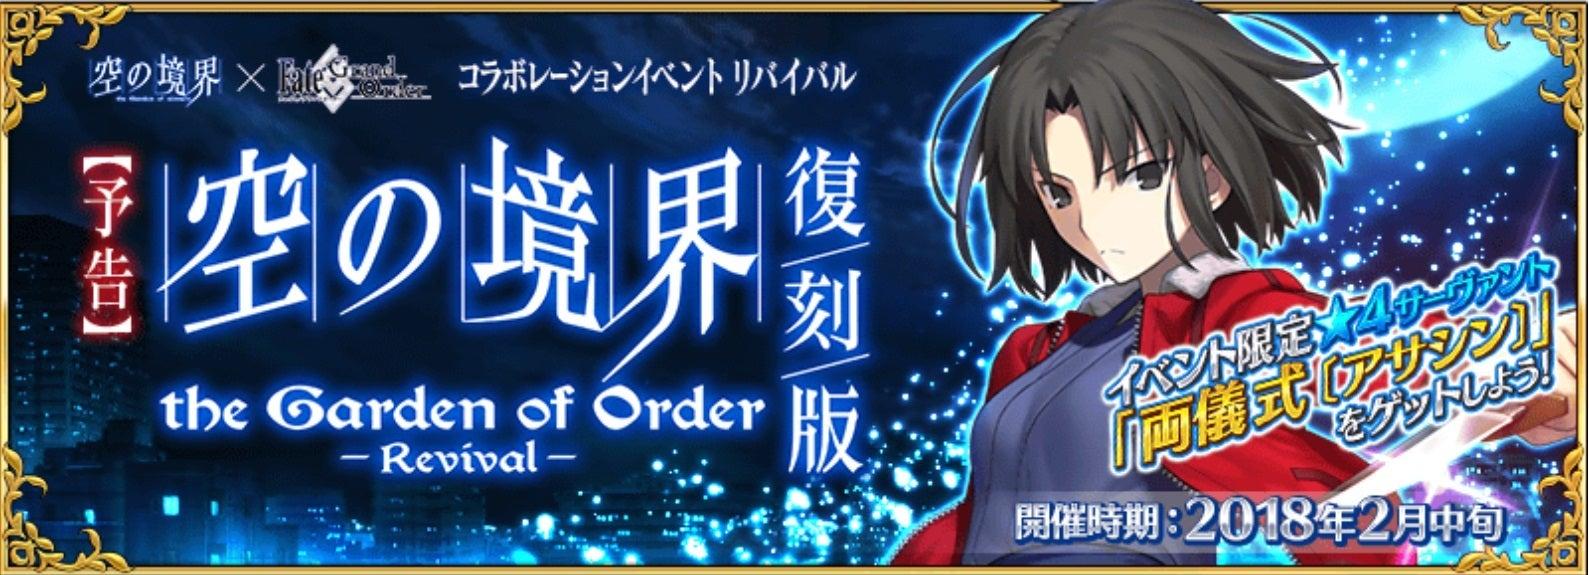 FGO攻略(Fate/Grand Order)Wikiトップページ - GAMY(ゲーミー)|日本最大級のゲームアプリの攻略Wikiサイト